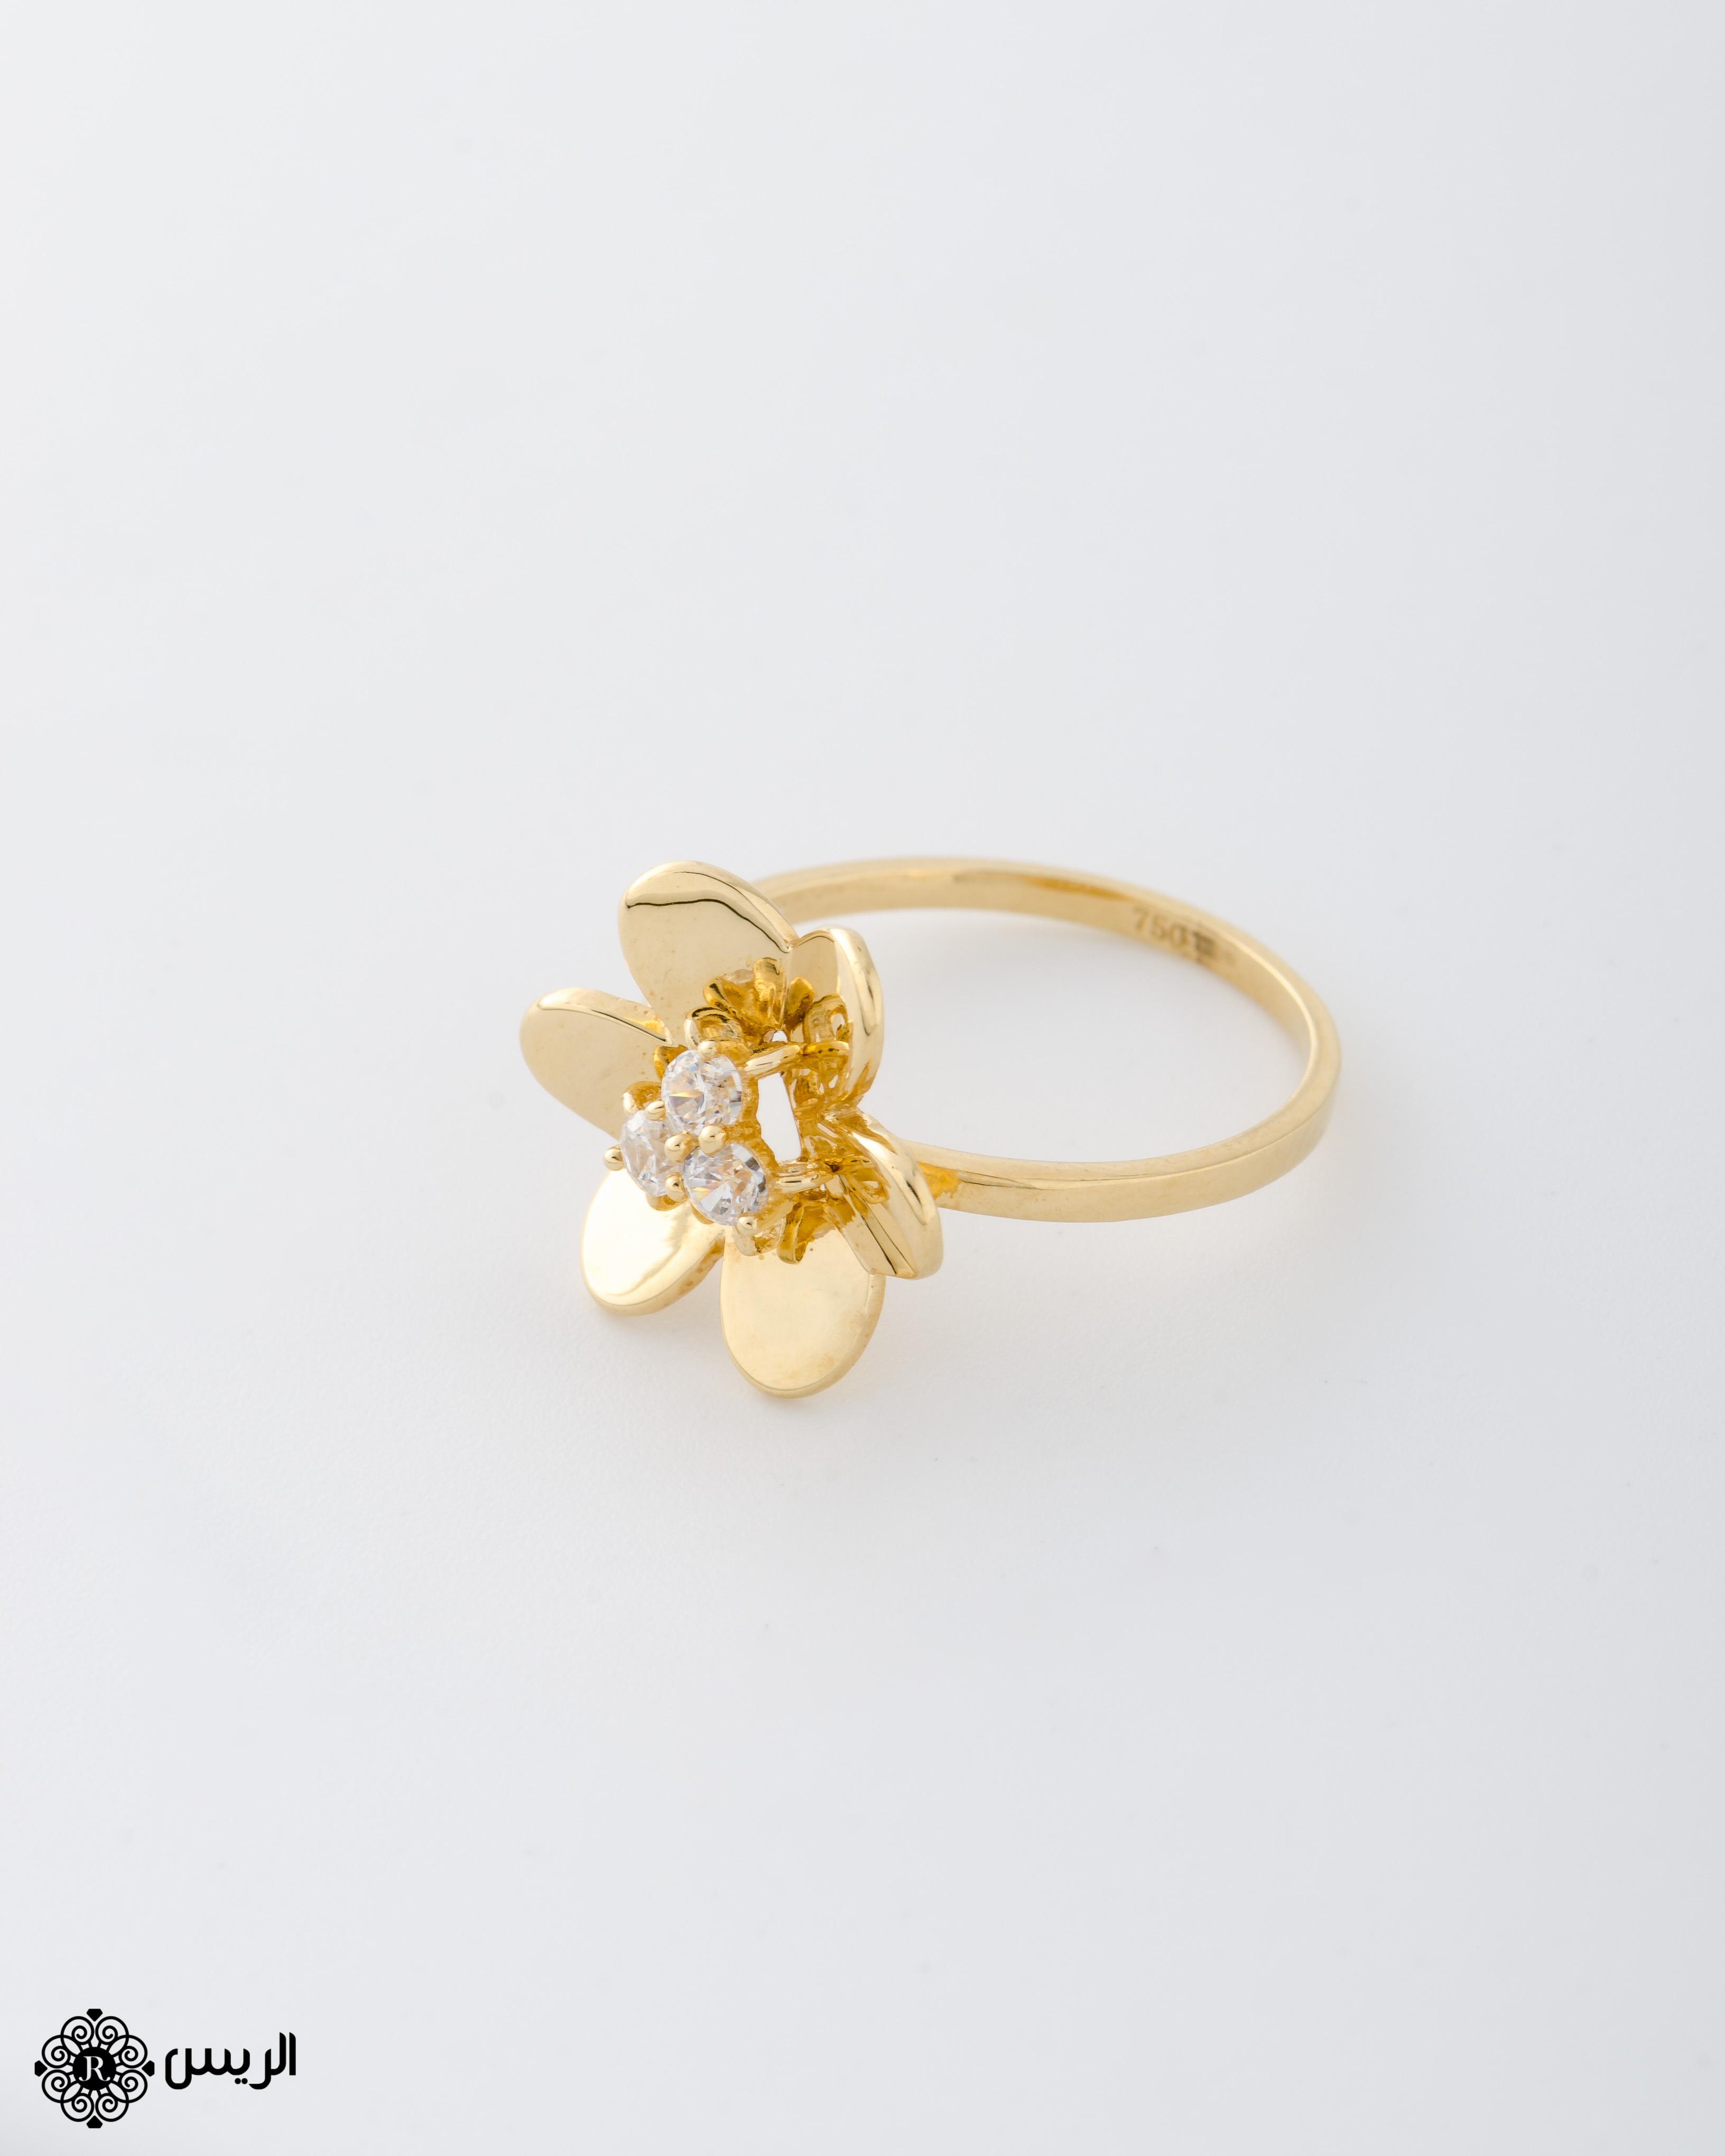 Raies jewelry Italian Design Flower Ring خاتم ورده تصميم إيطالي الريس للمجوهرات